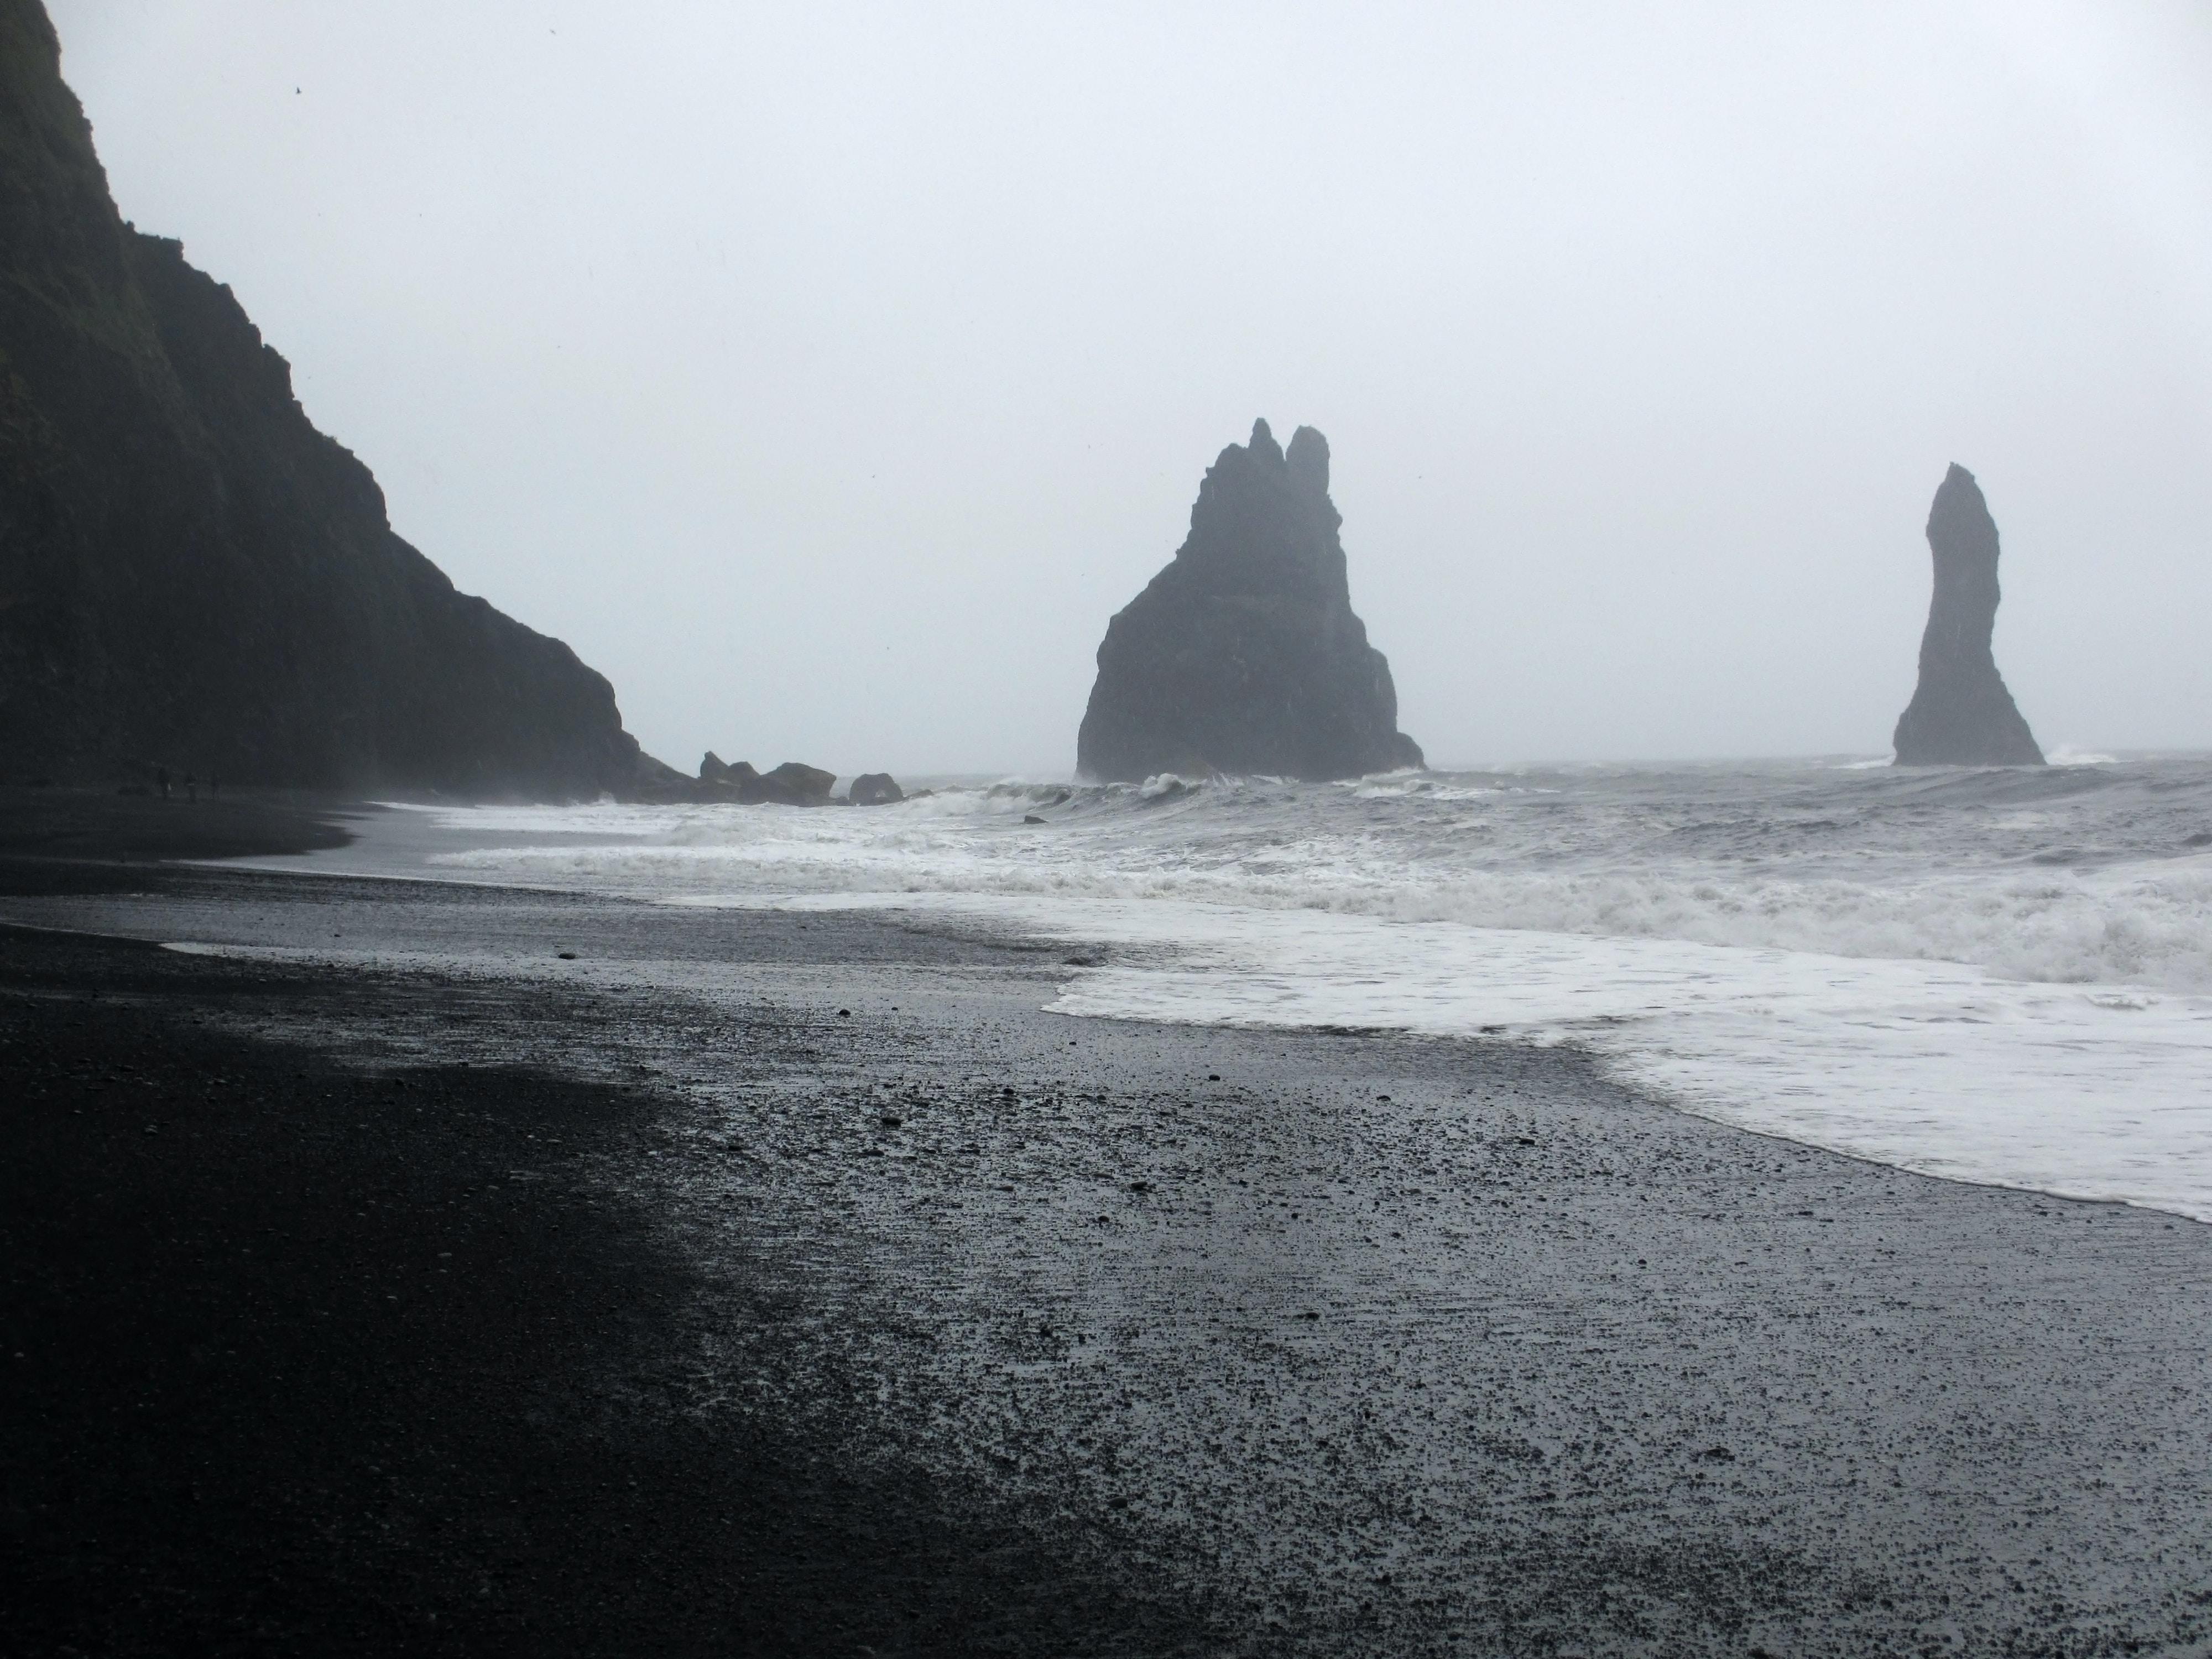 scenery of ocean